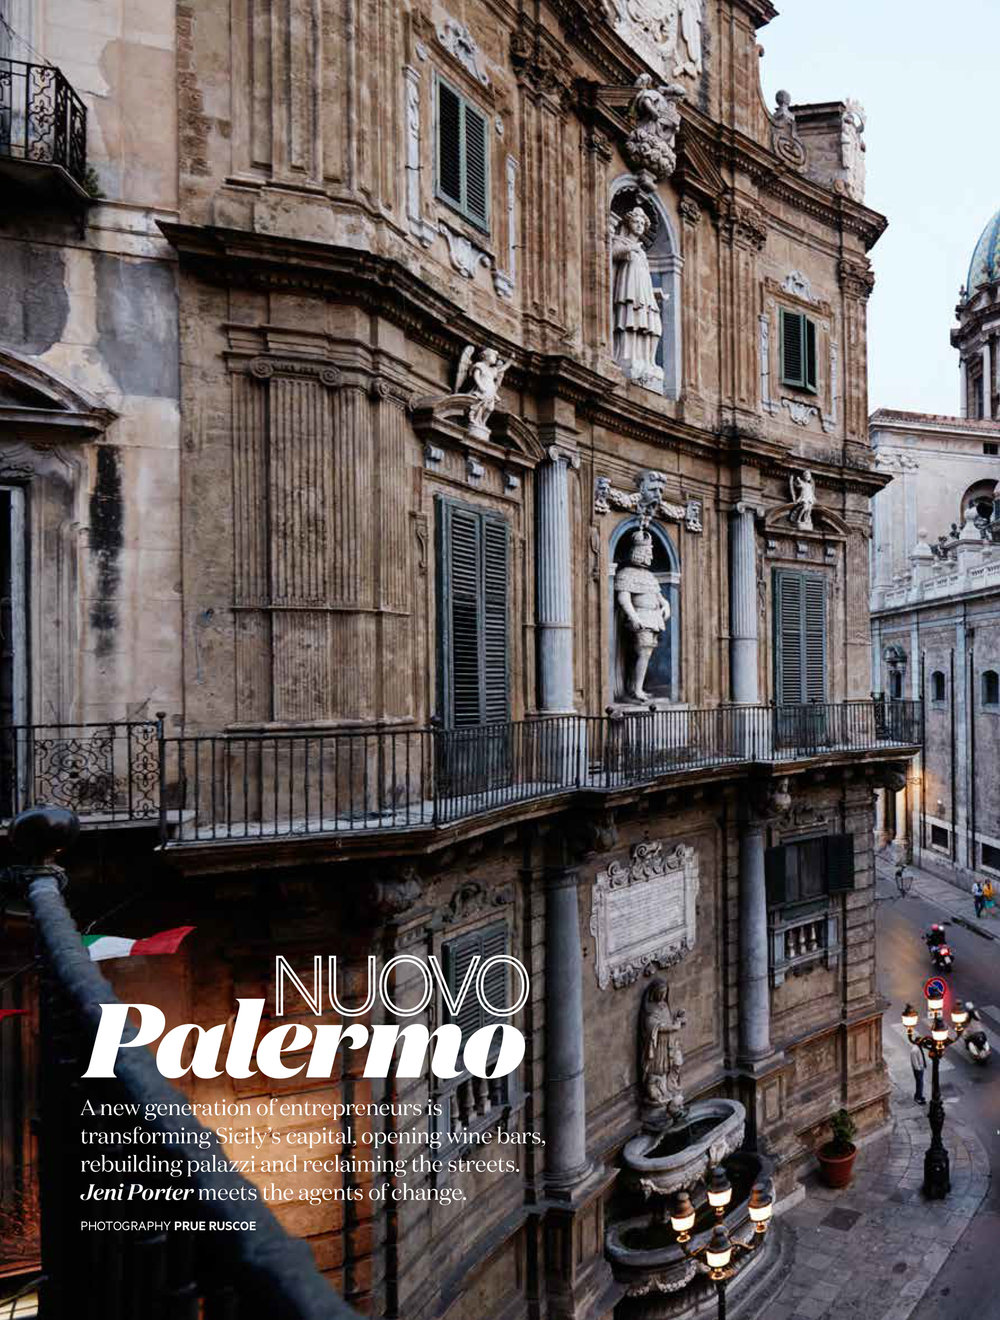 Palermo-1.jpg